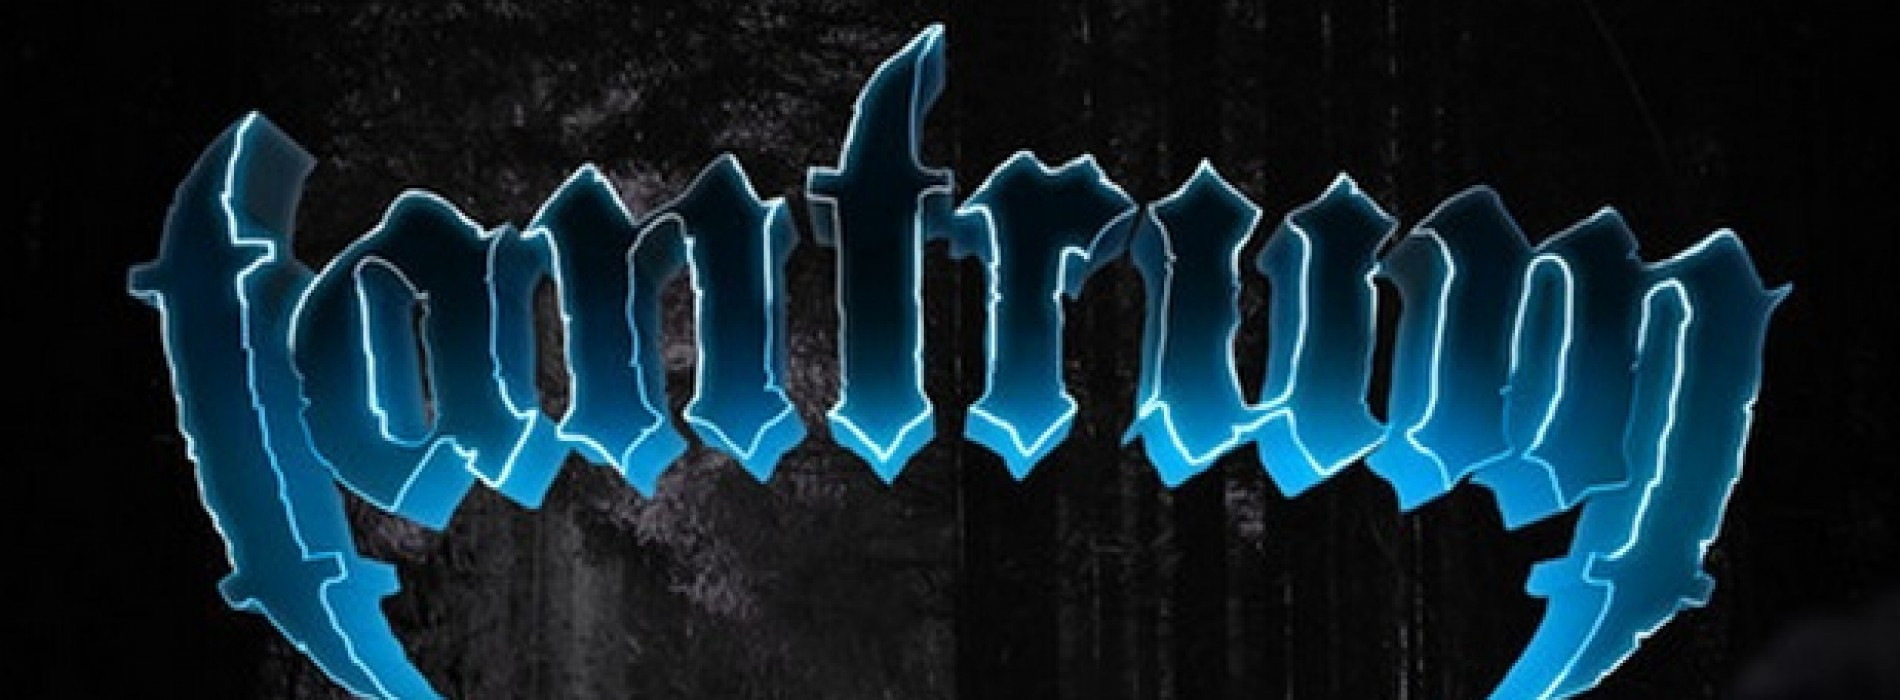 Tantrum – Purgatory Of Sinners (iClown Remix)